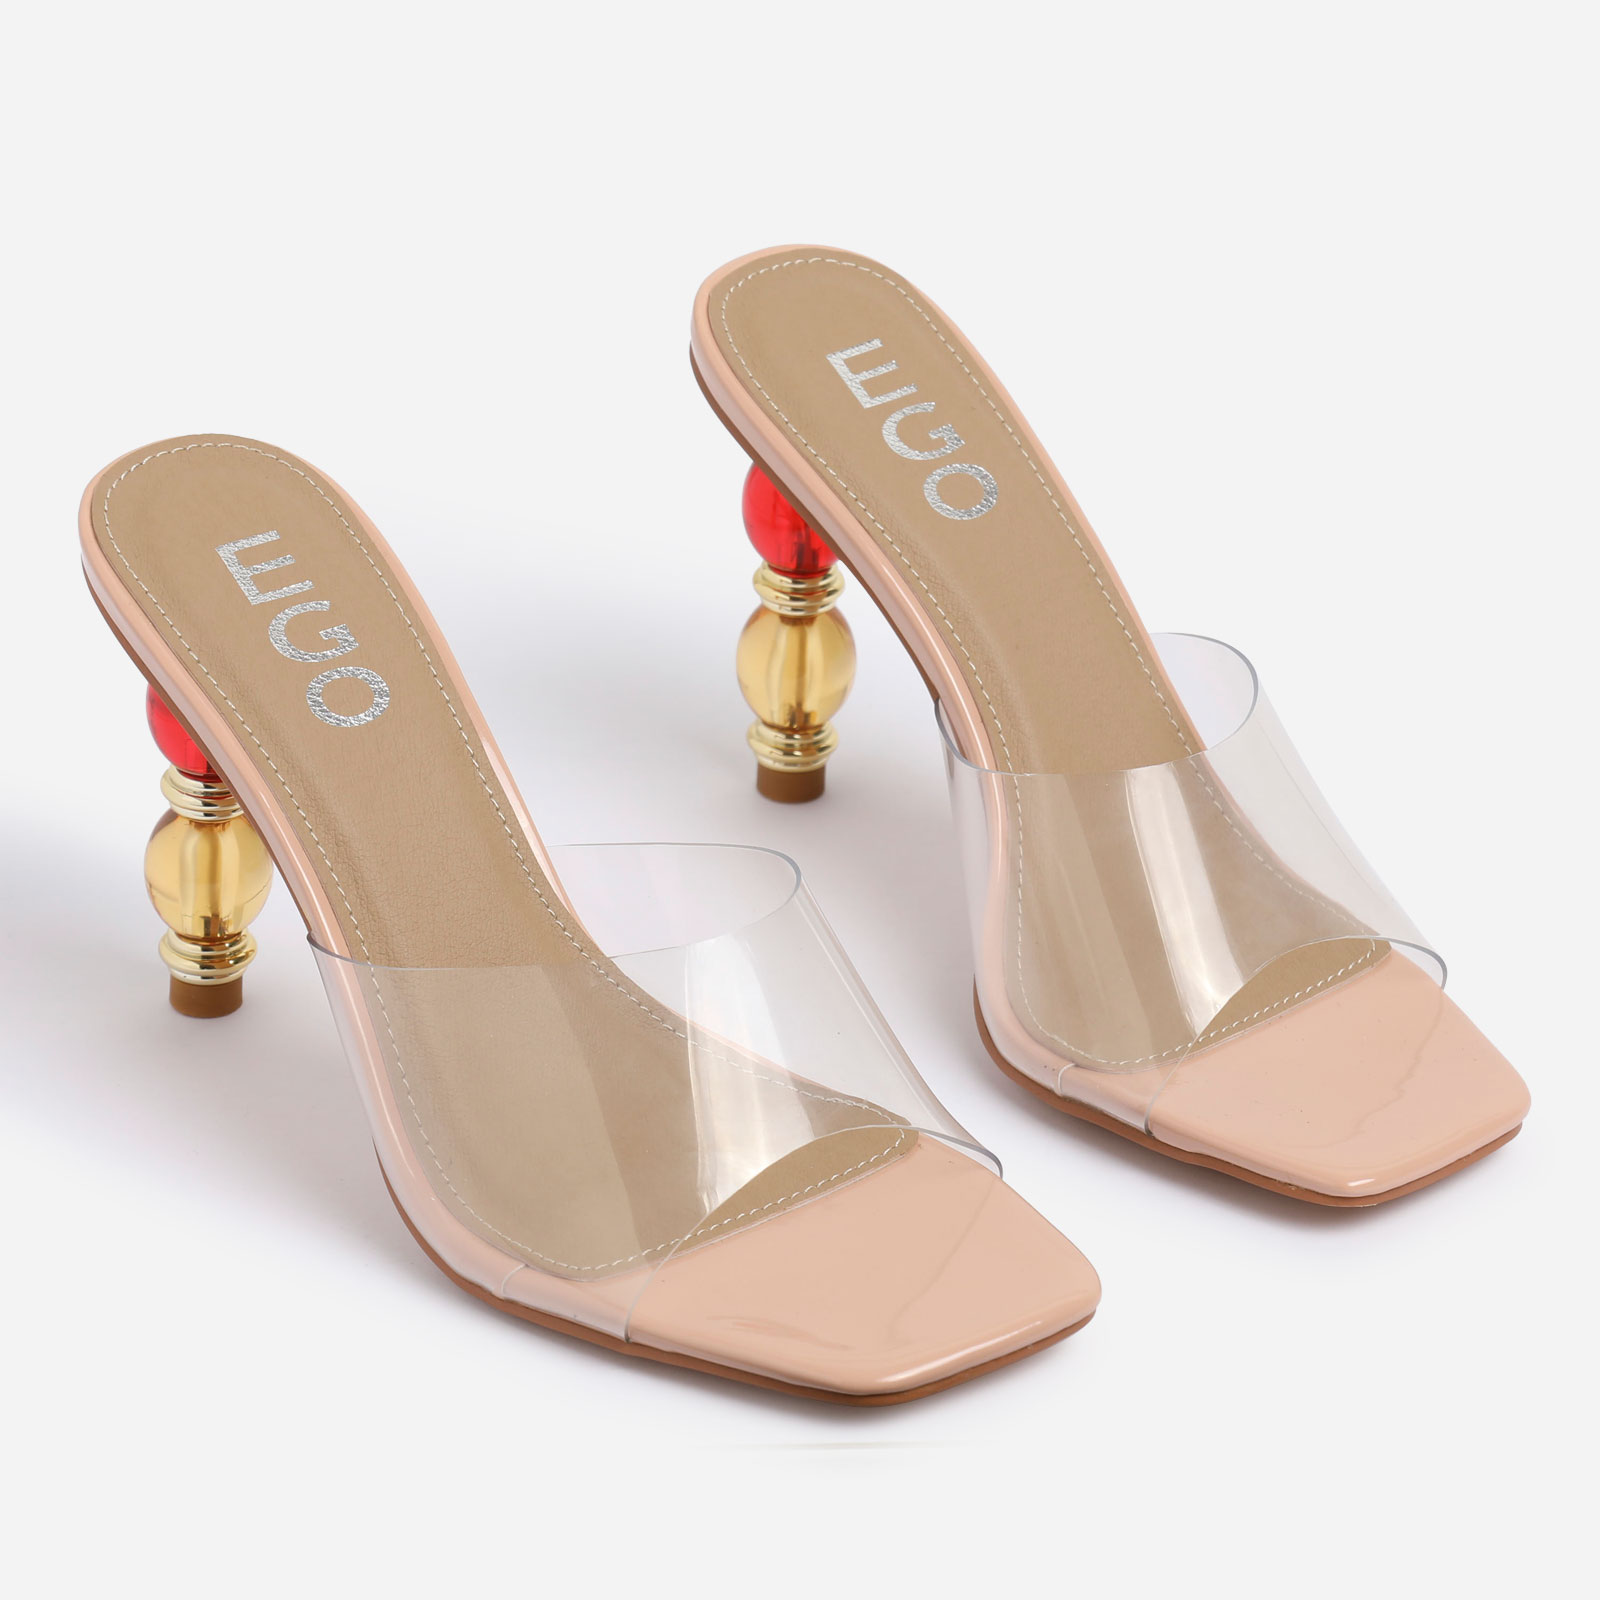 Wanda Peep Toe Beaded Heel Mule In Nude Patent